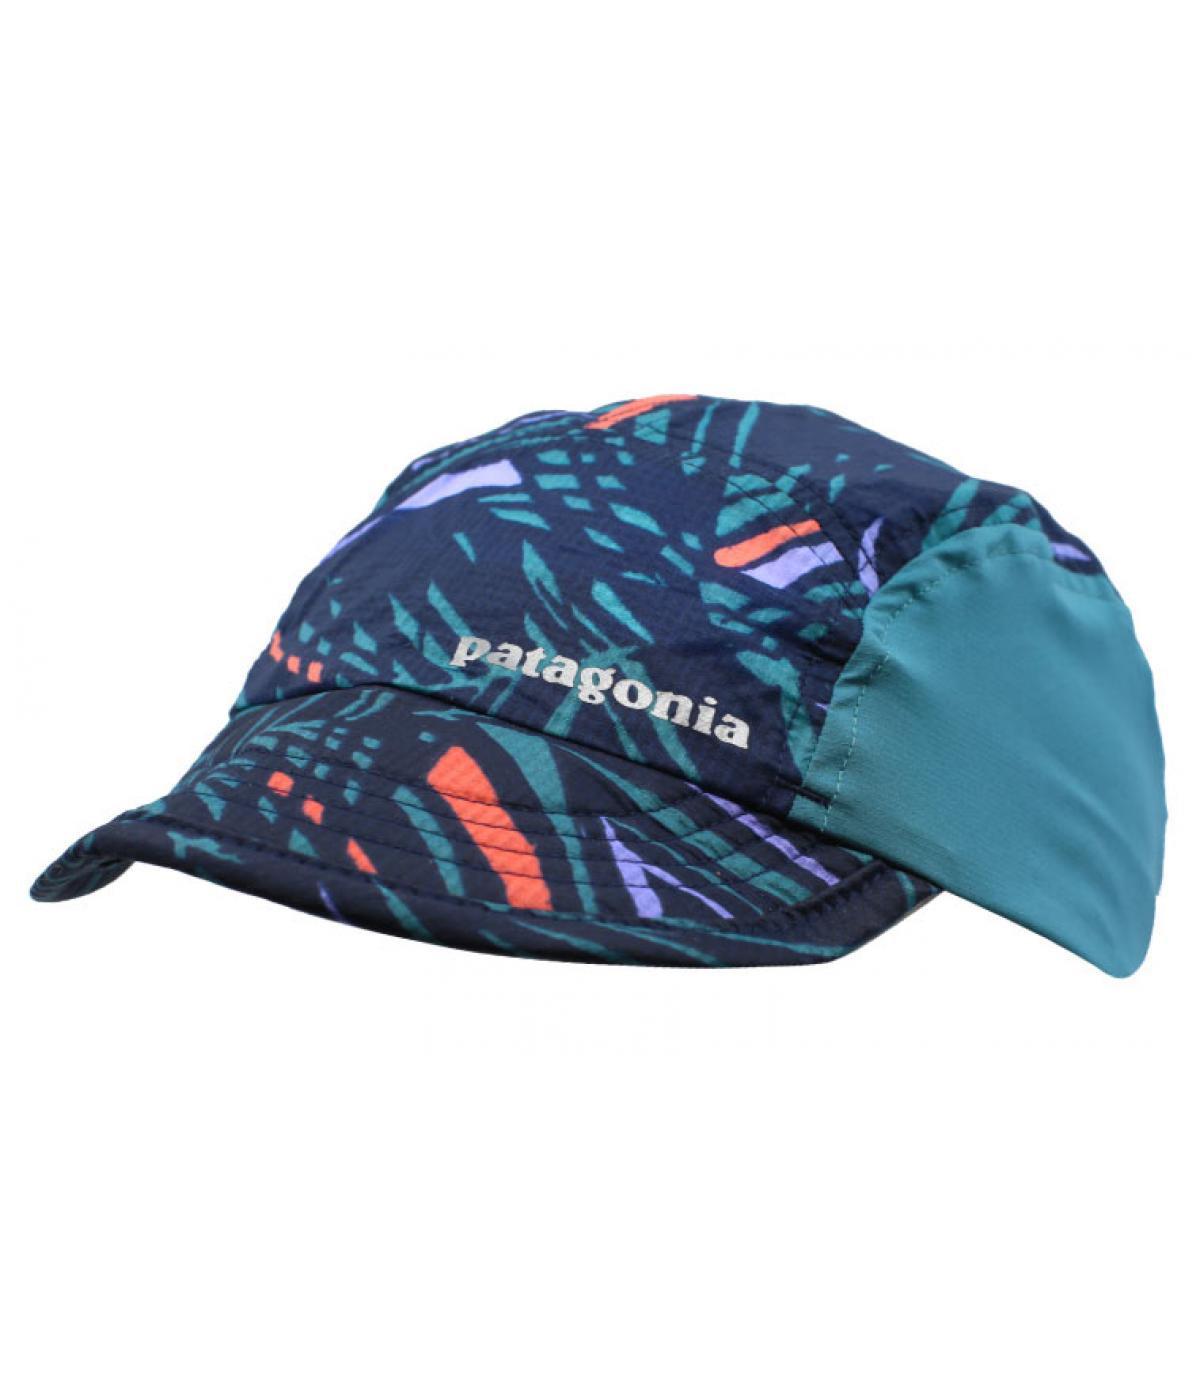 Patagonia cap pattern - Airdini Cap Rain Fern navy by Patagonia. Headict 463f91b13fc